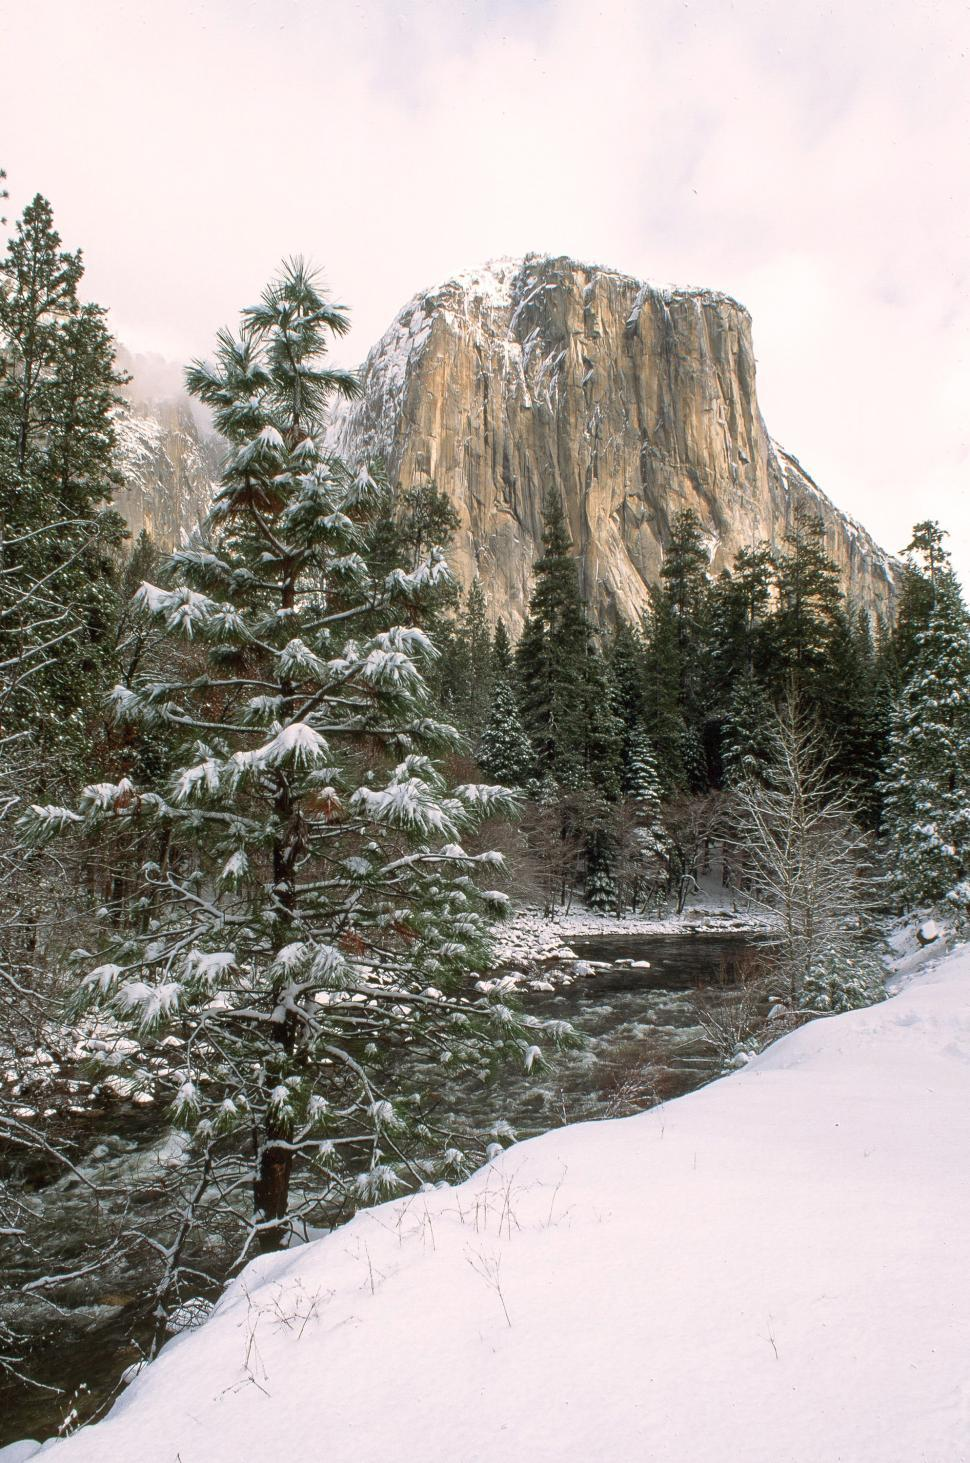 Download Free Stock HD Photo of El Capitan in California Online